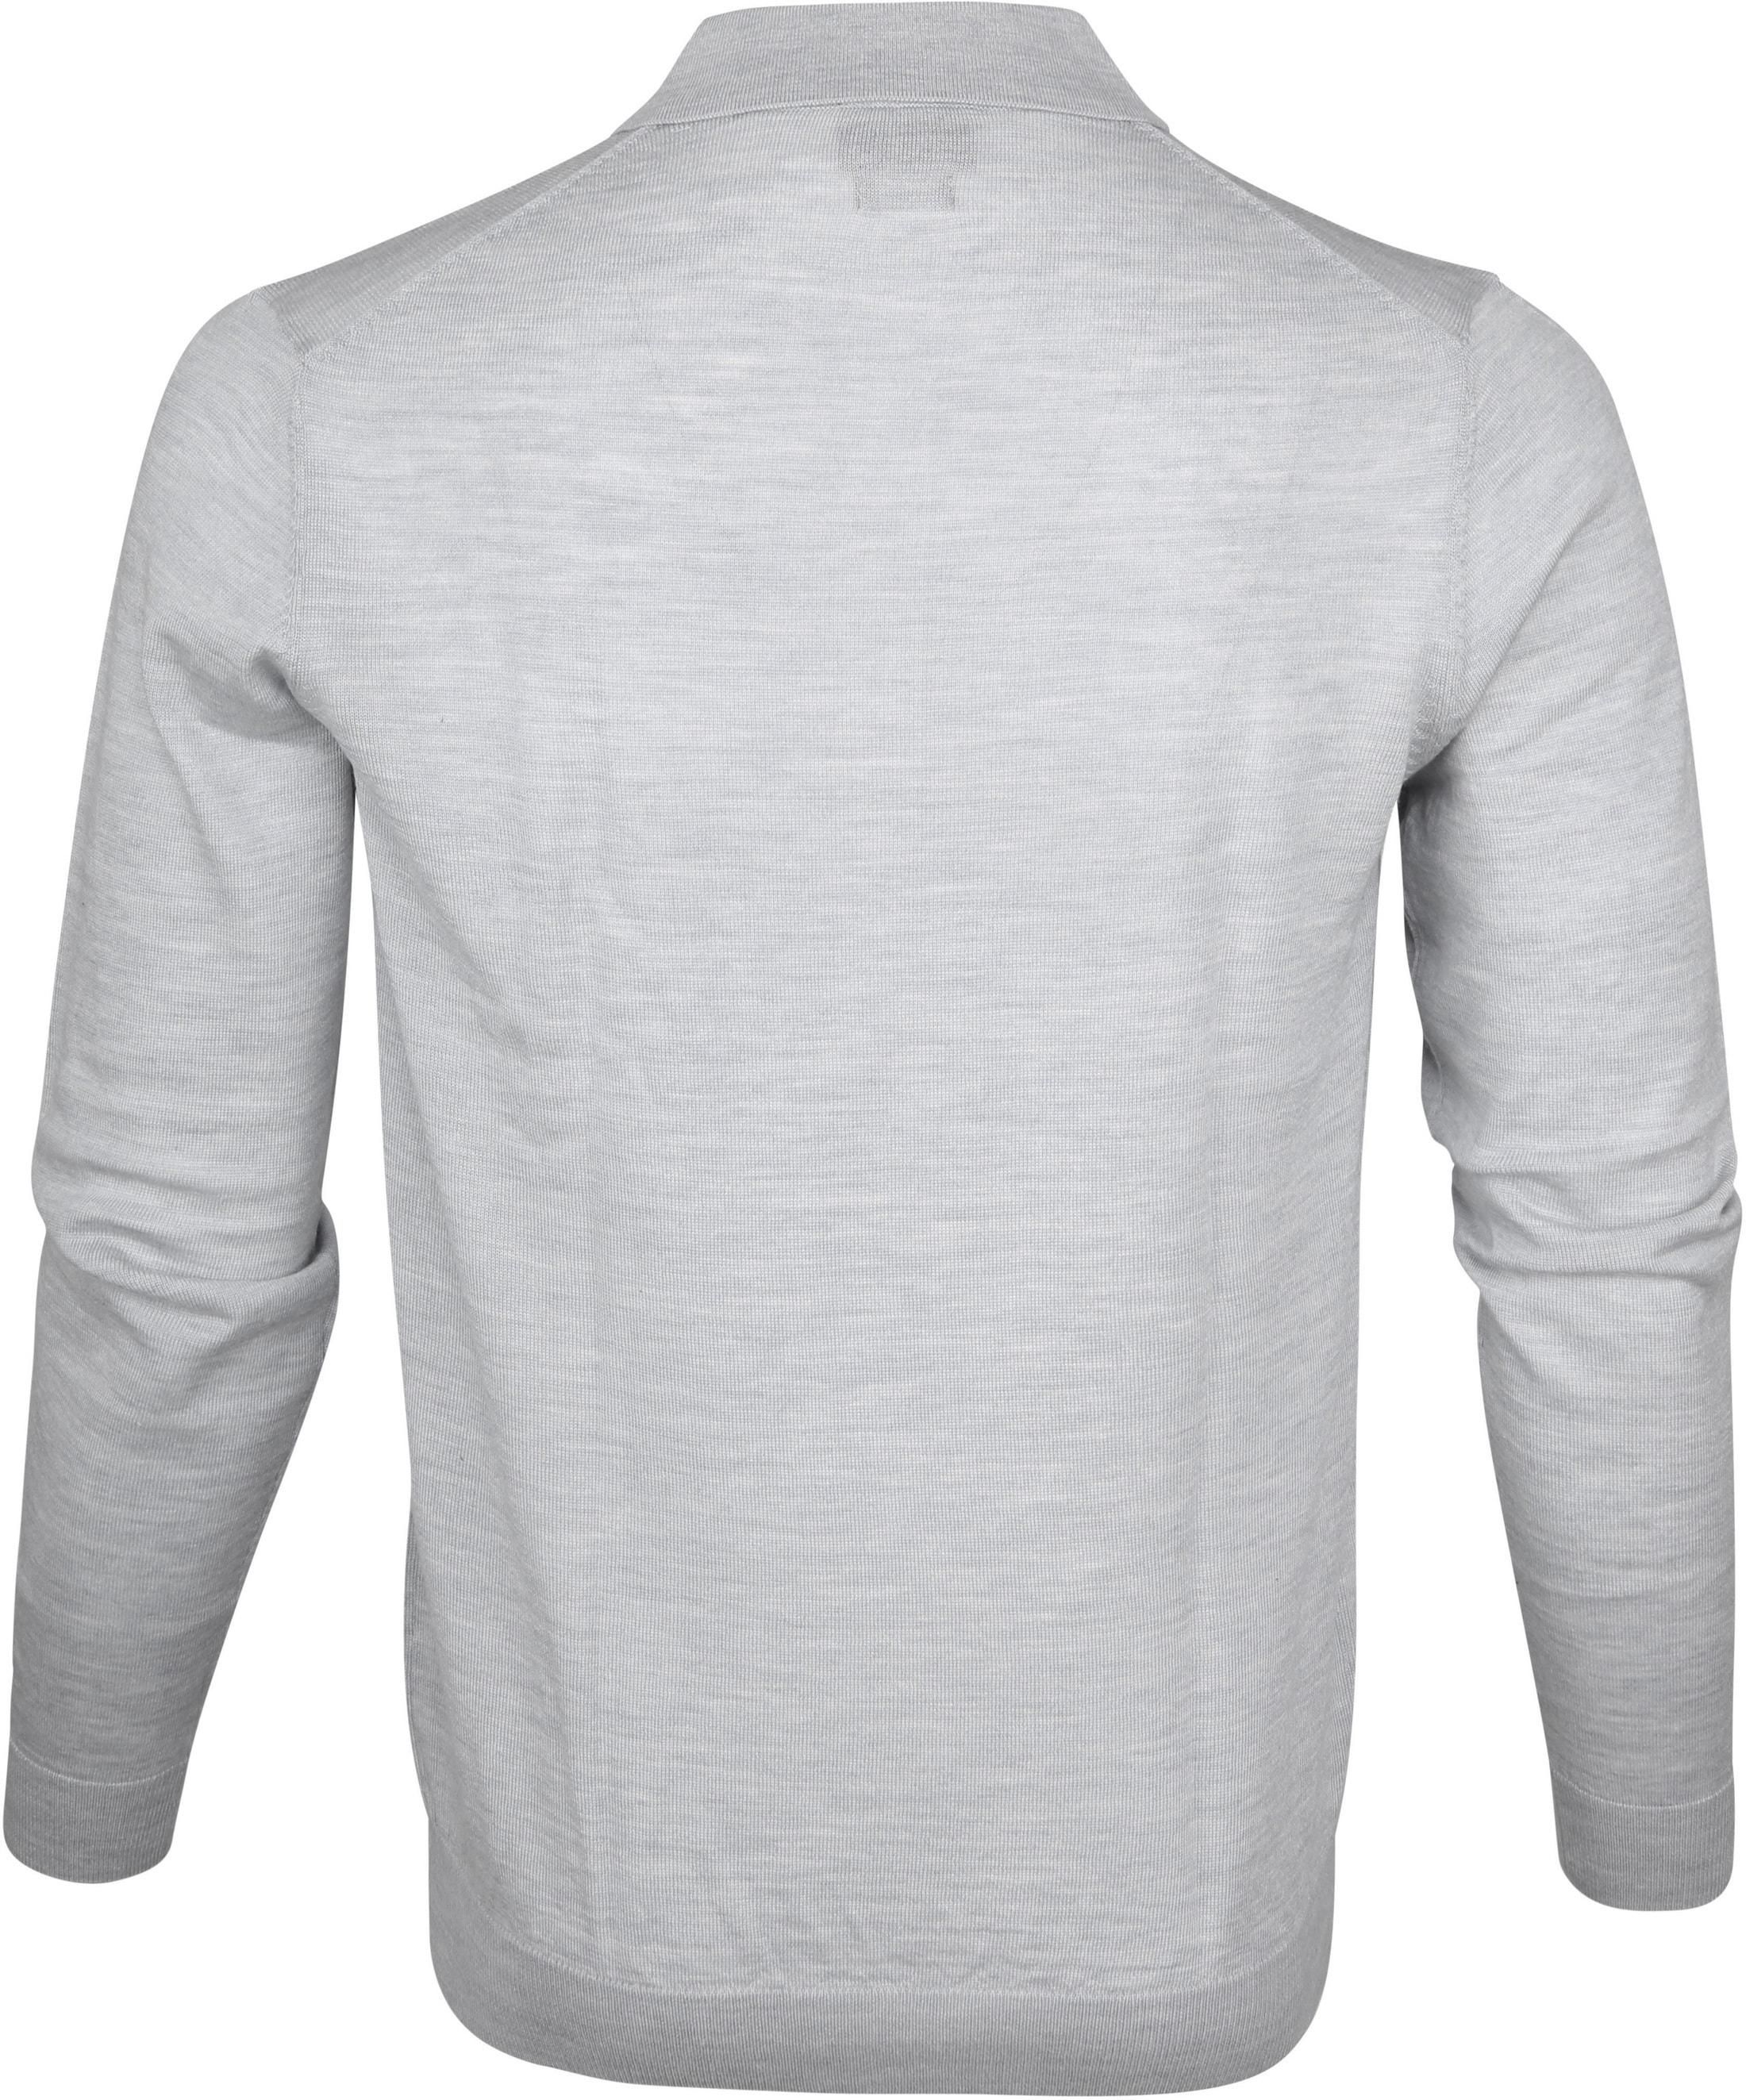 Profuomo Longsleeve Poloshirt Grey foto 3